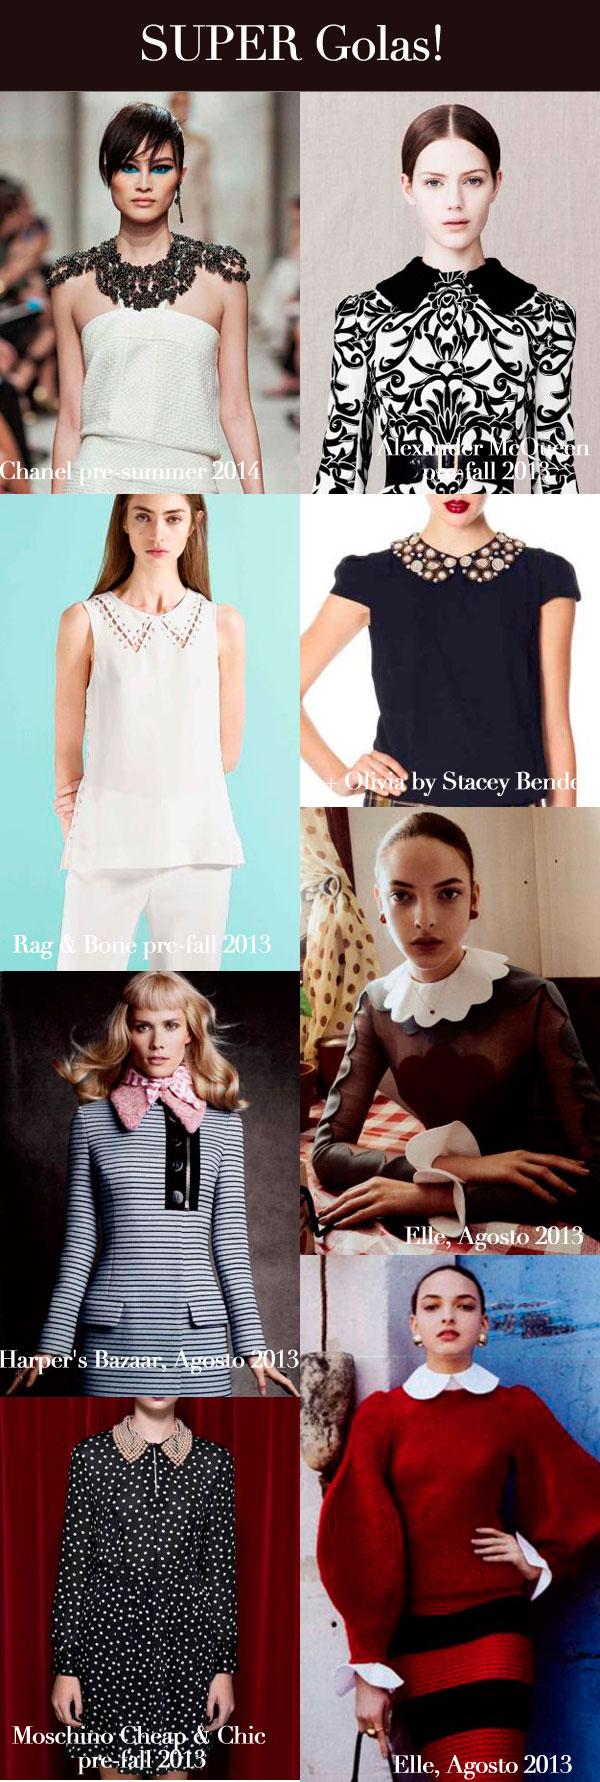 Contrast-collars-gola-moda